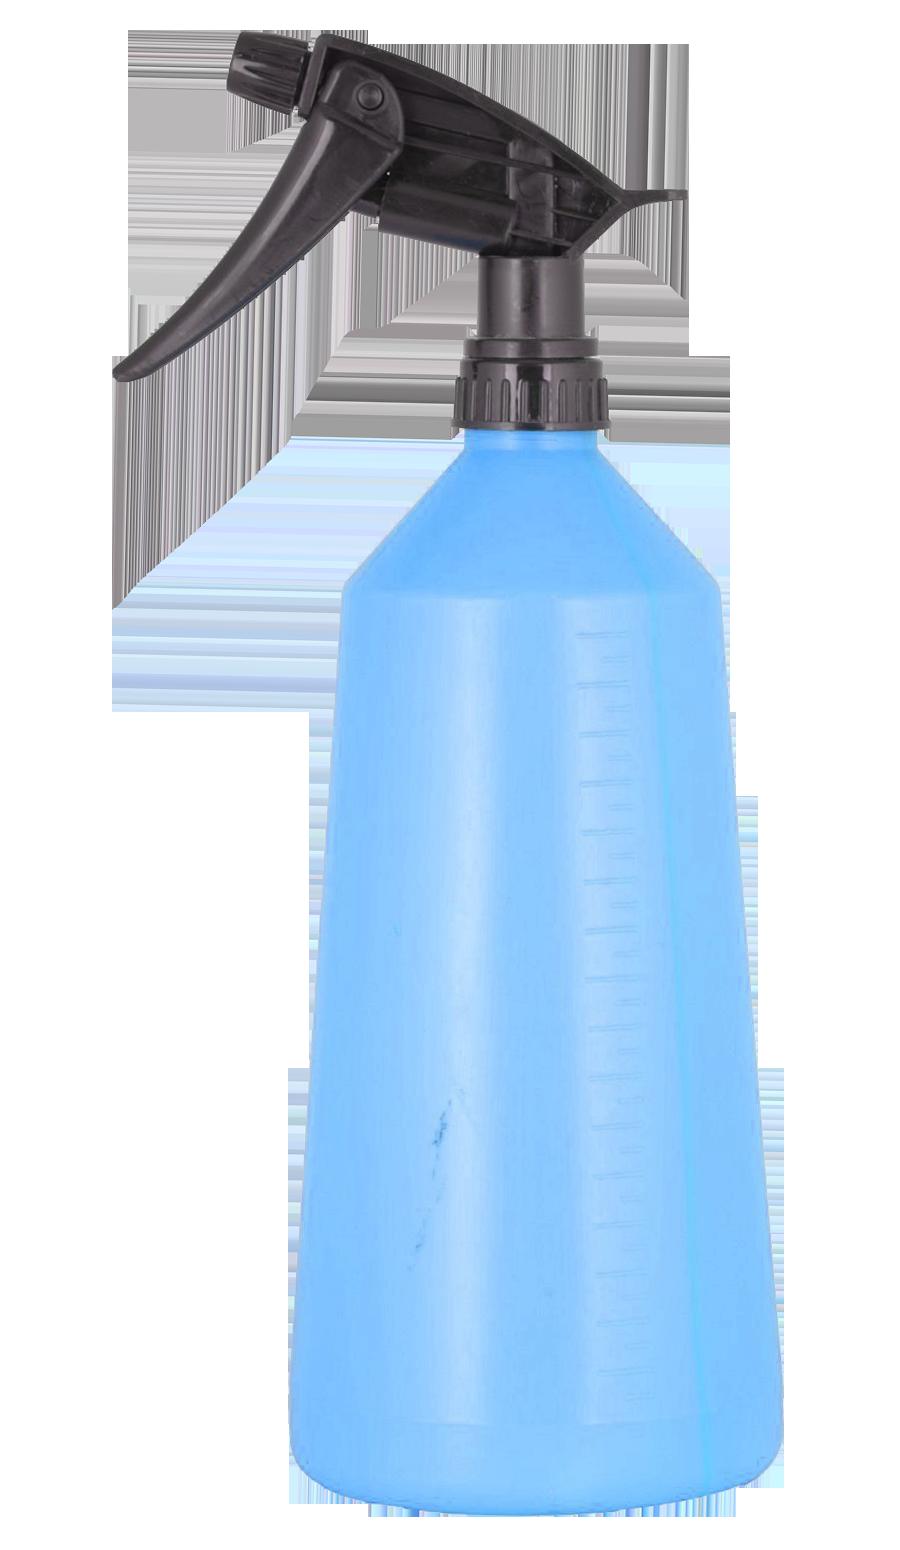 Spray Bottle PNG Image